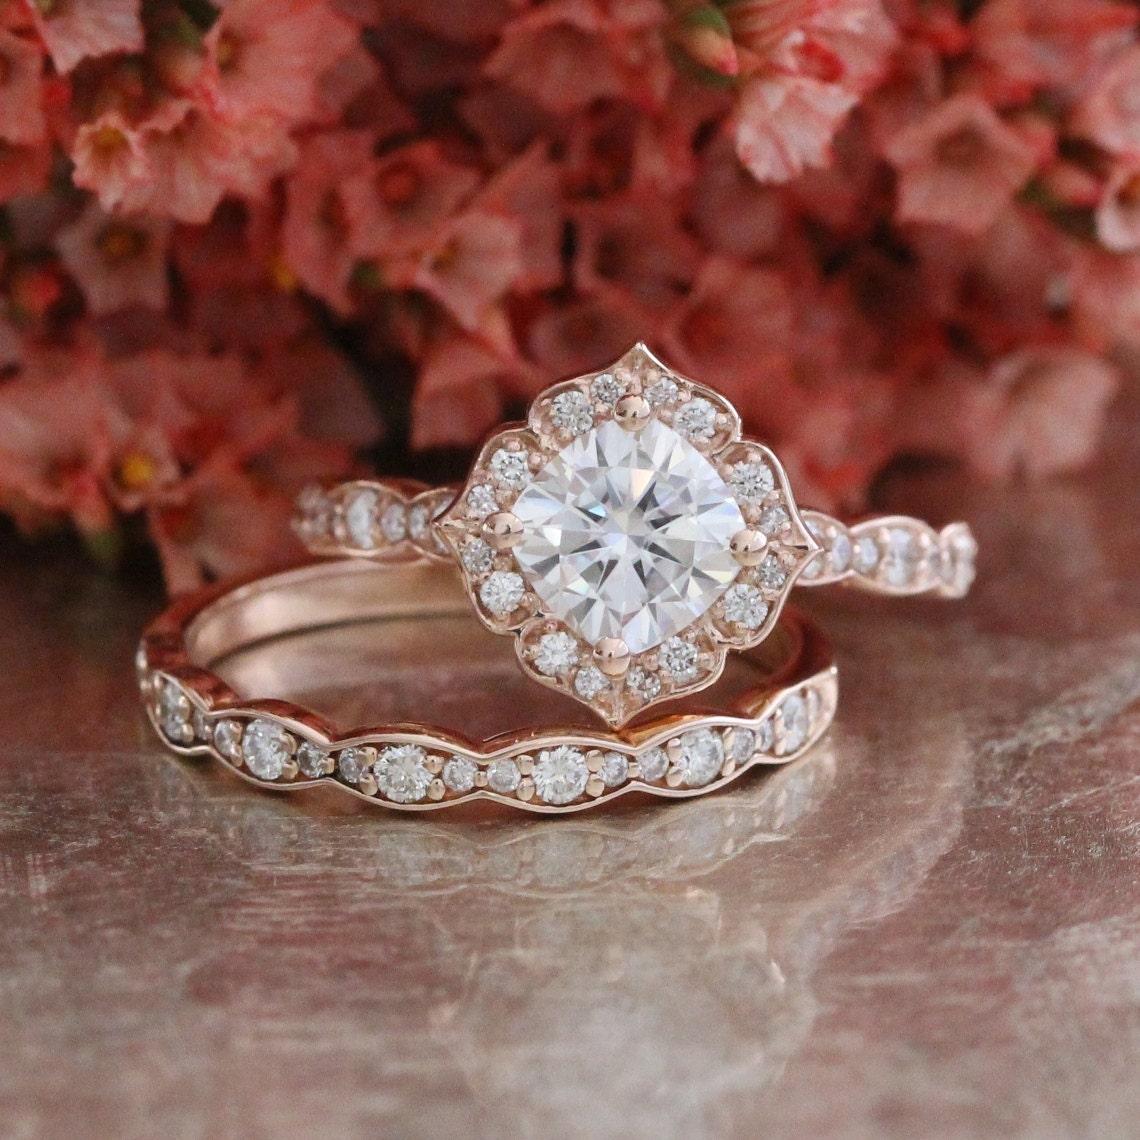 Forever One Moissanite Engagement Ring and Scalloped Diamond